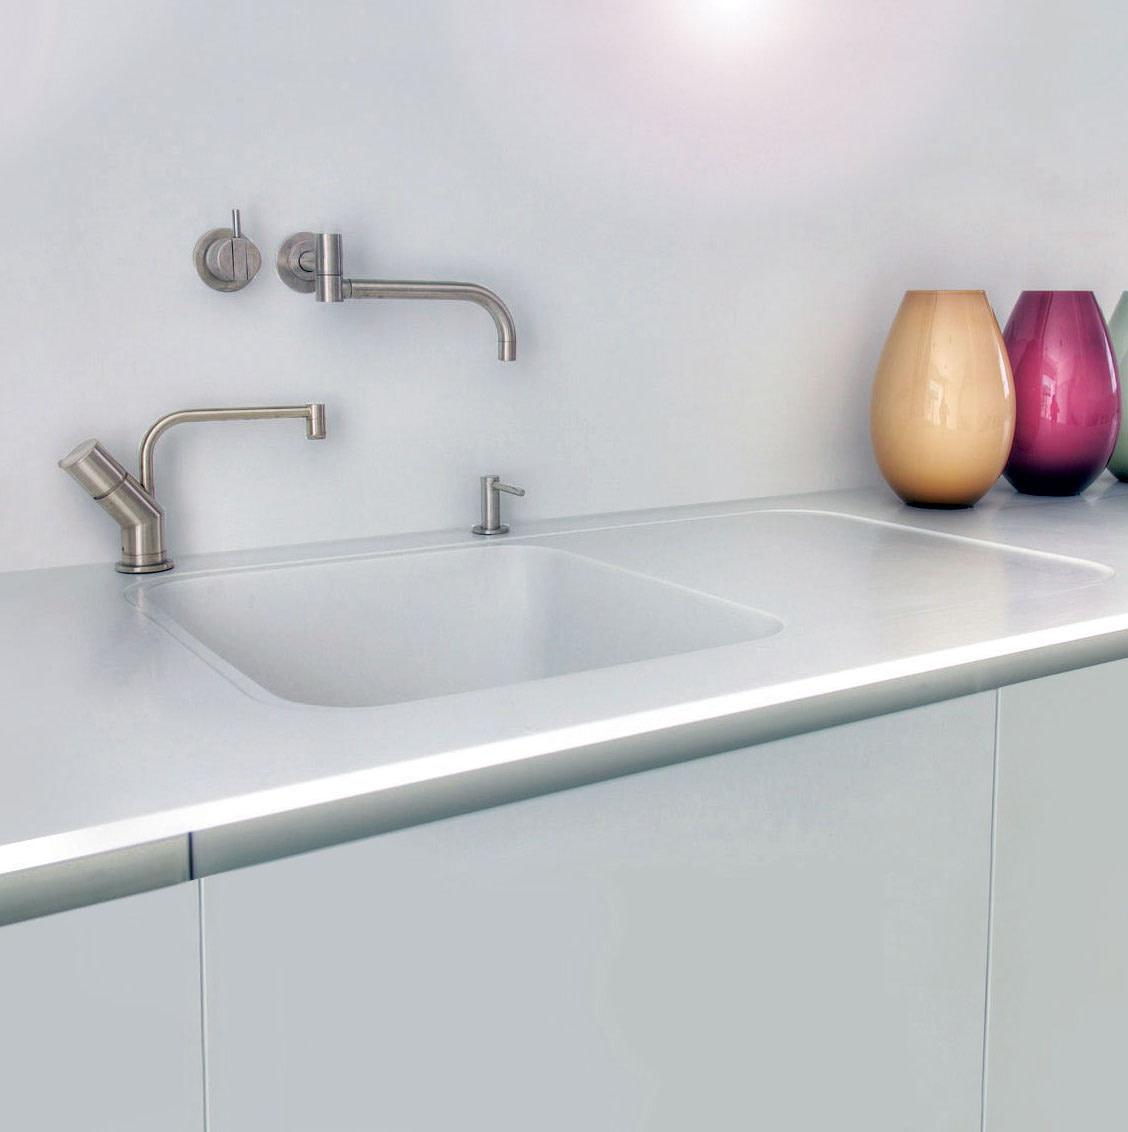 Hi-Macs sink with recessed drainer